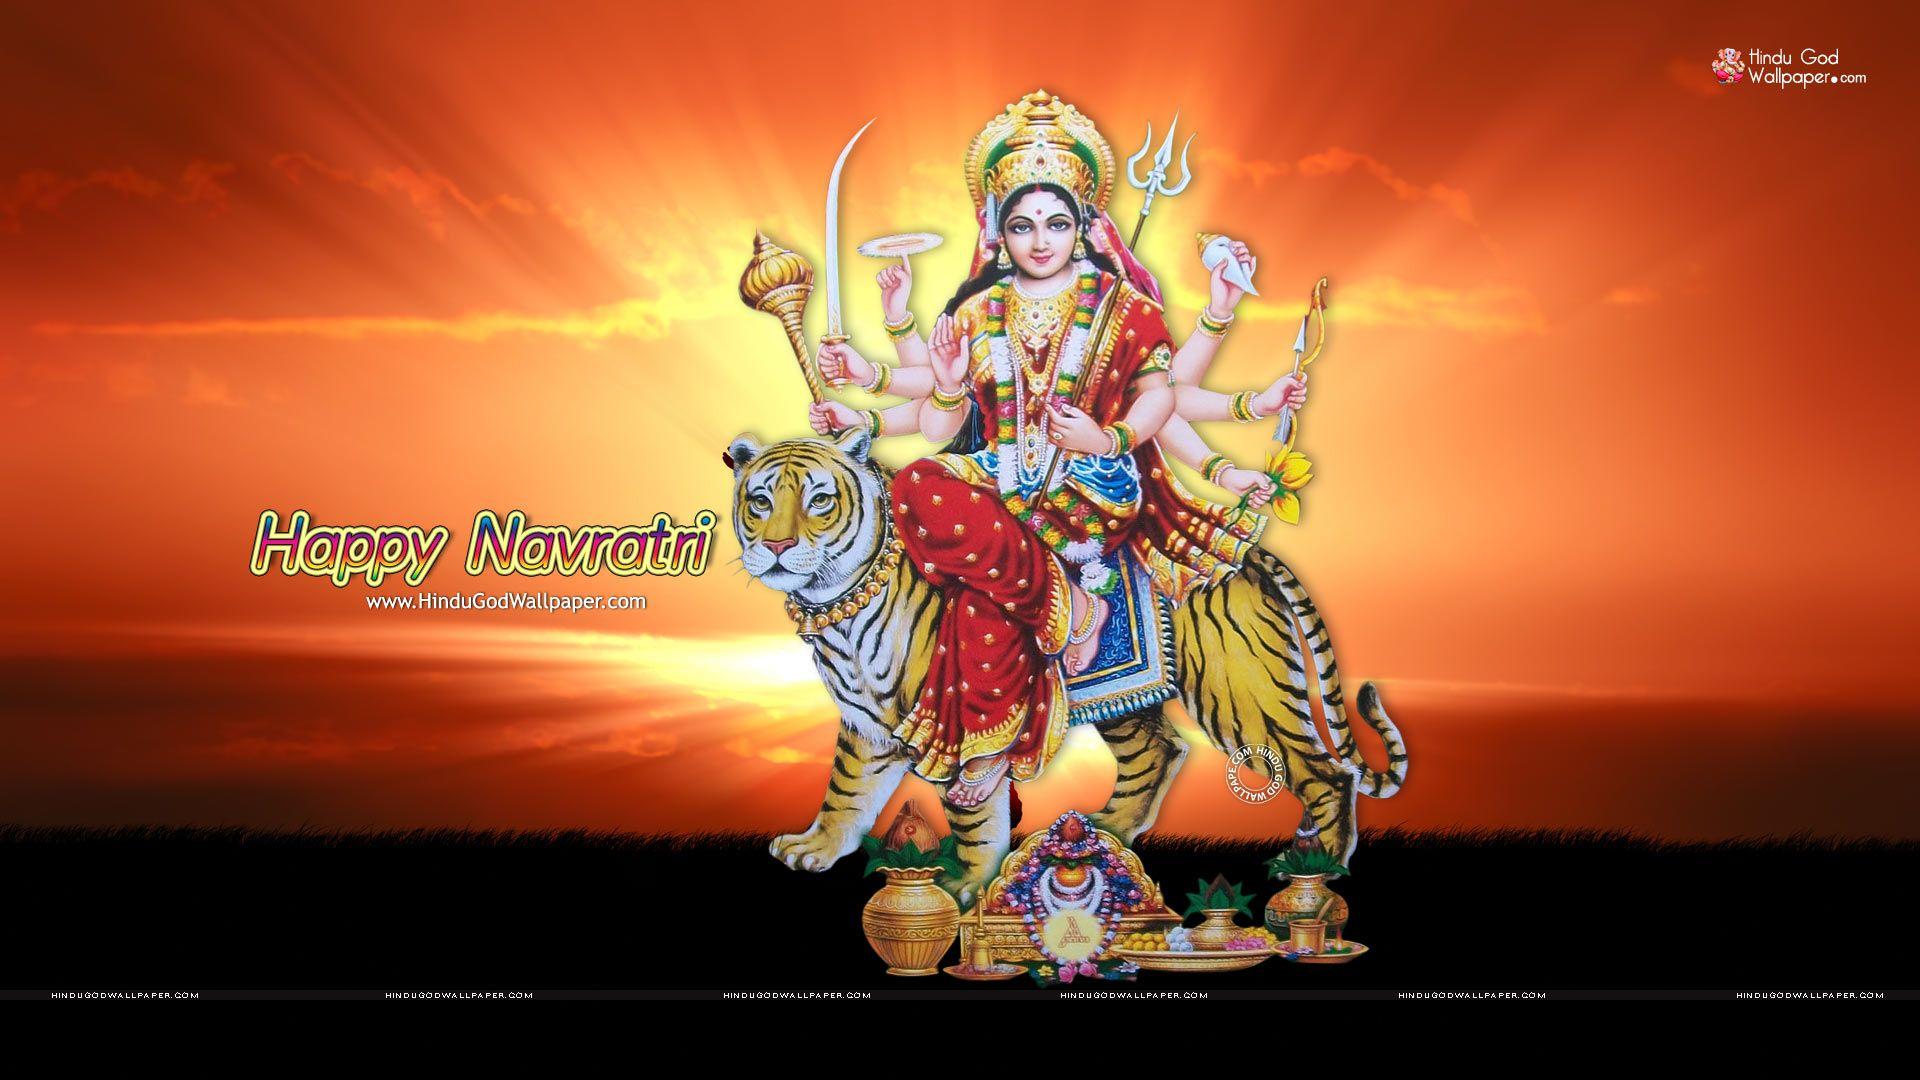 1080p Happy Navratri Hd Wallpaper Full Size Download Hd Wallpapers 1080p Hd Wallpaper Navratri Wallpaper